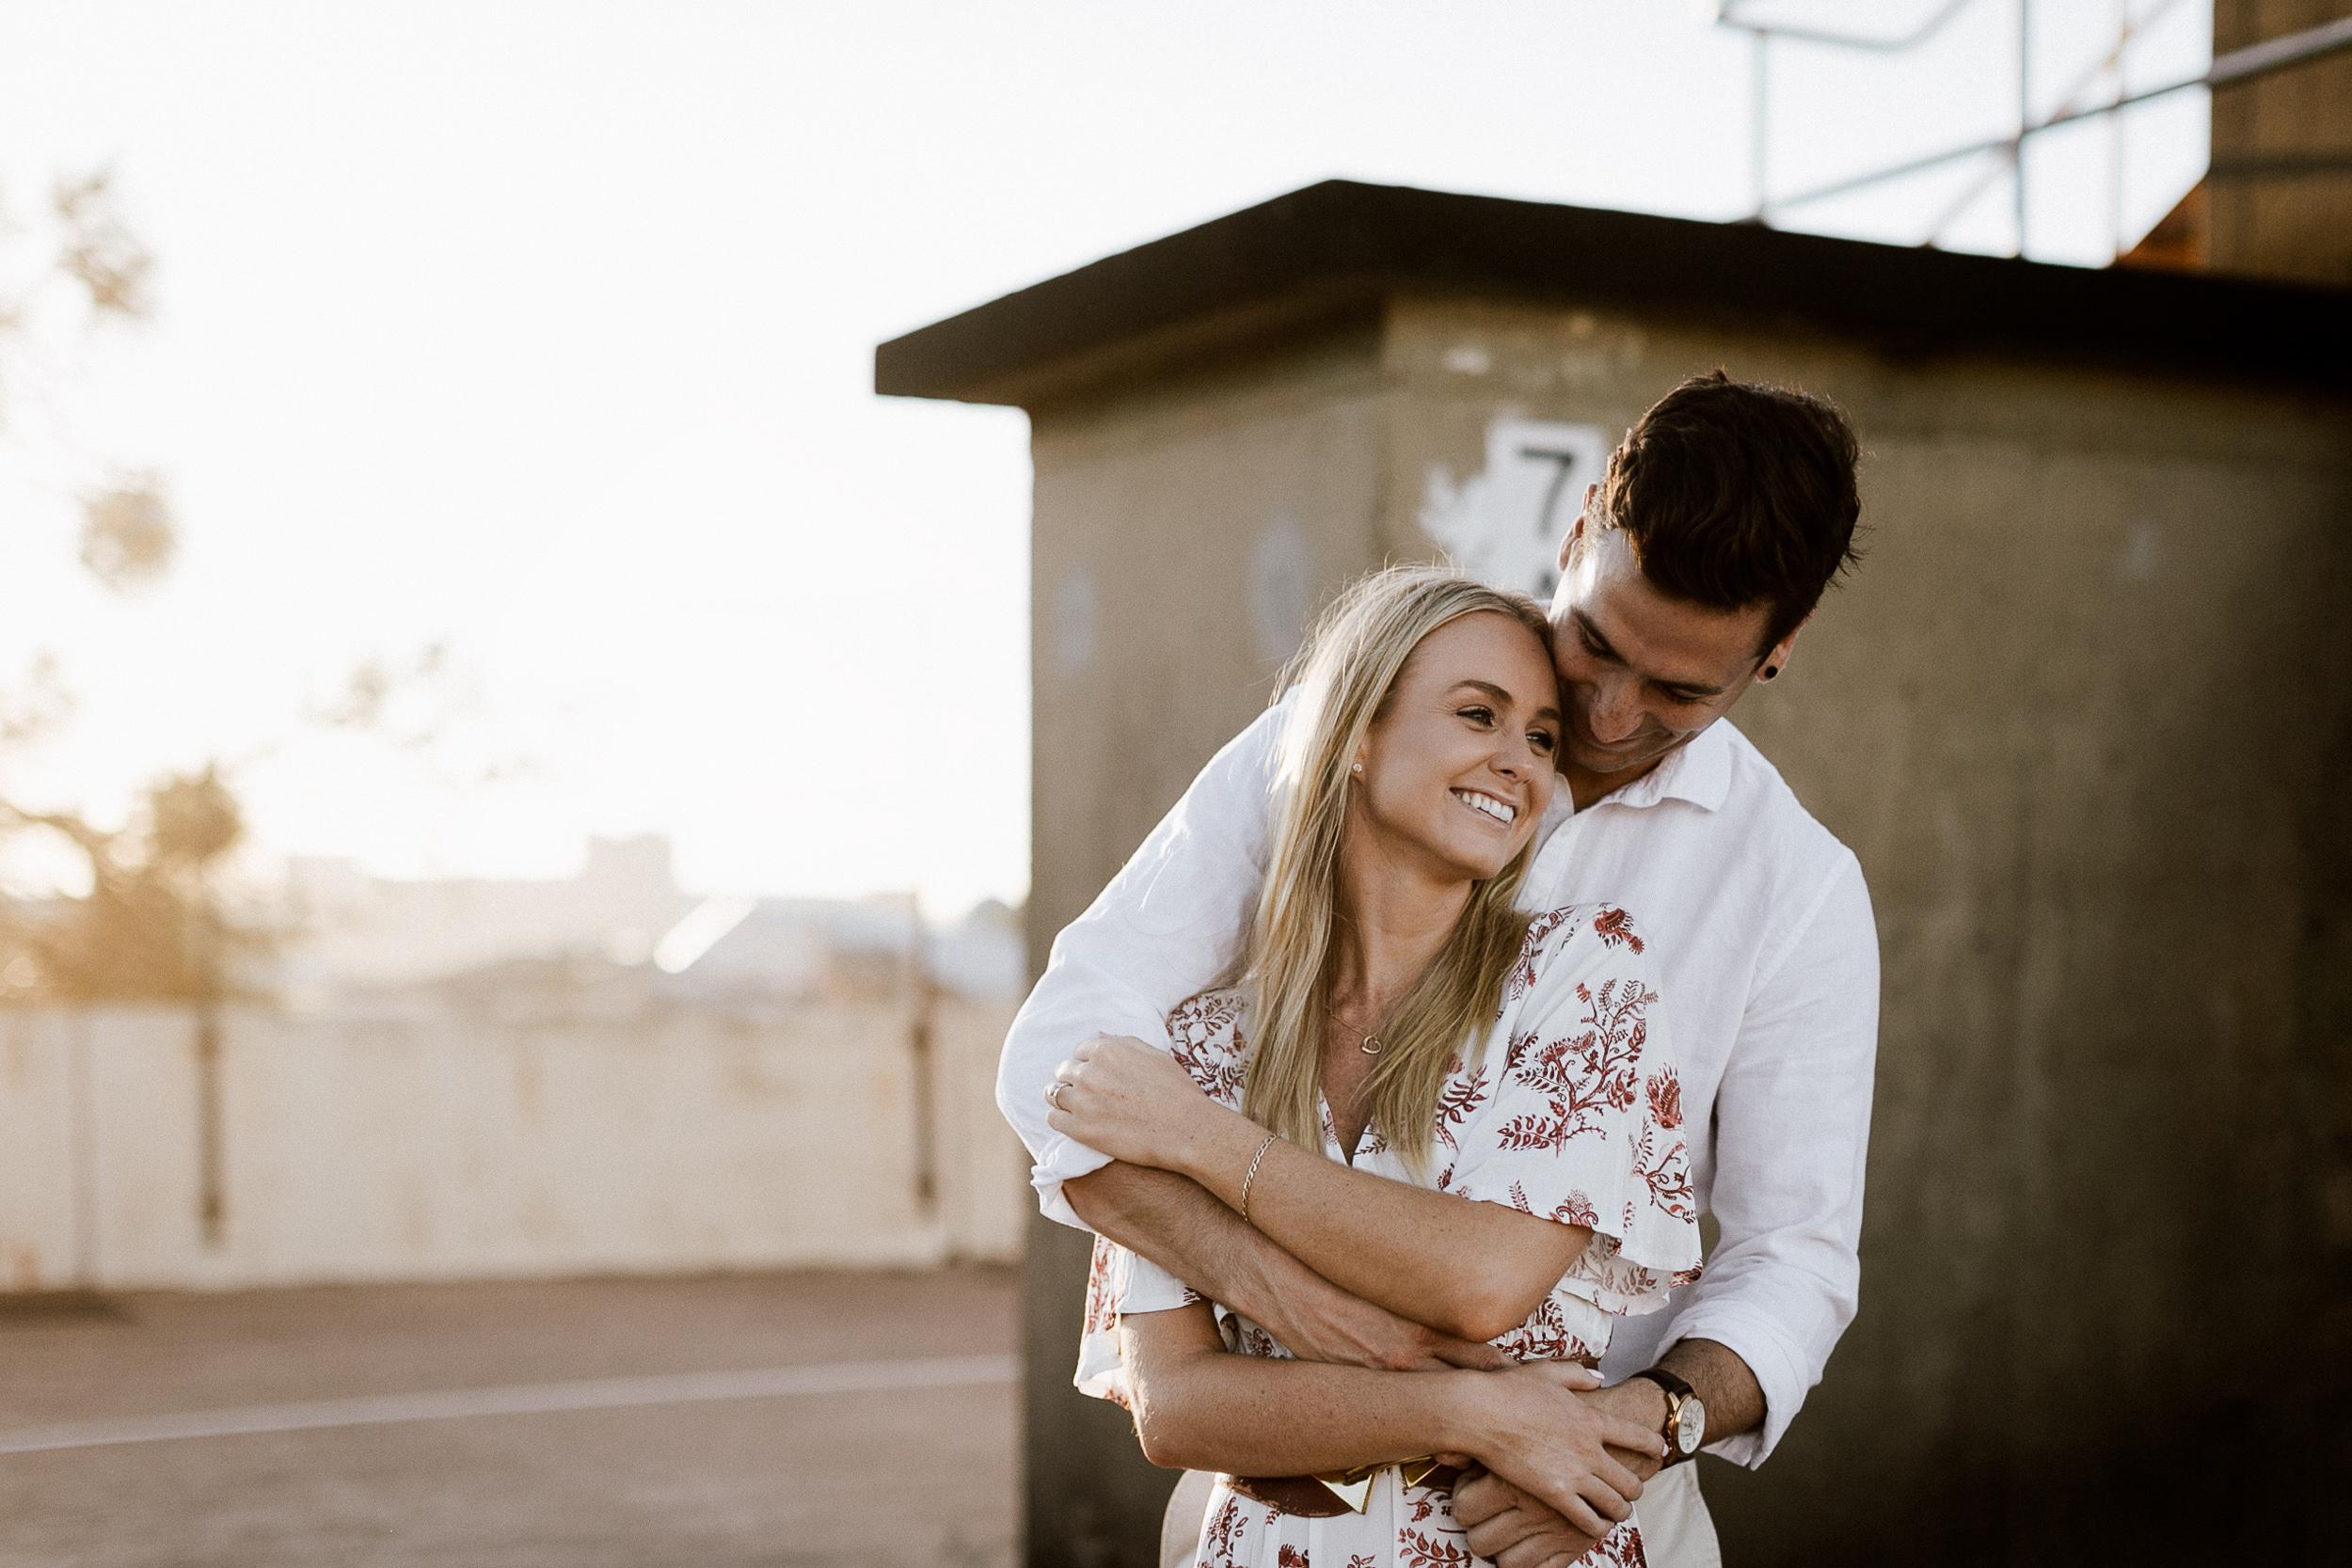 kirsty_andrew_pre_wedding_gez_xavier_mansfield_photography_2019-3.jpg